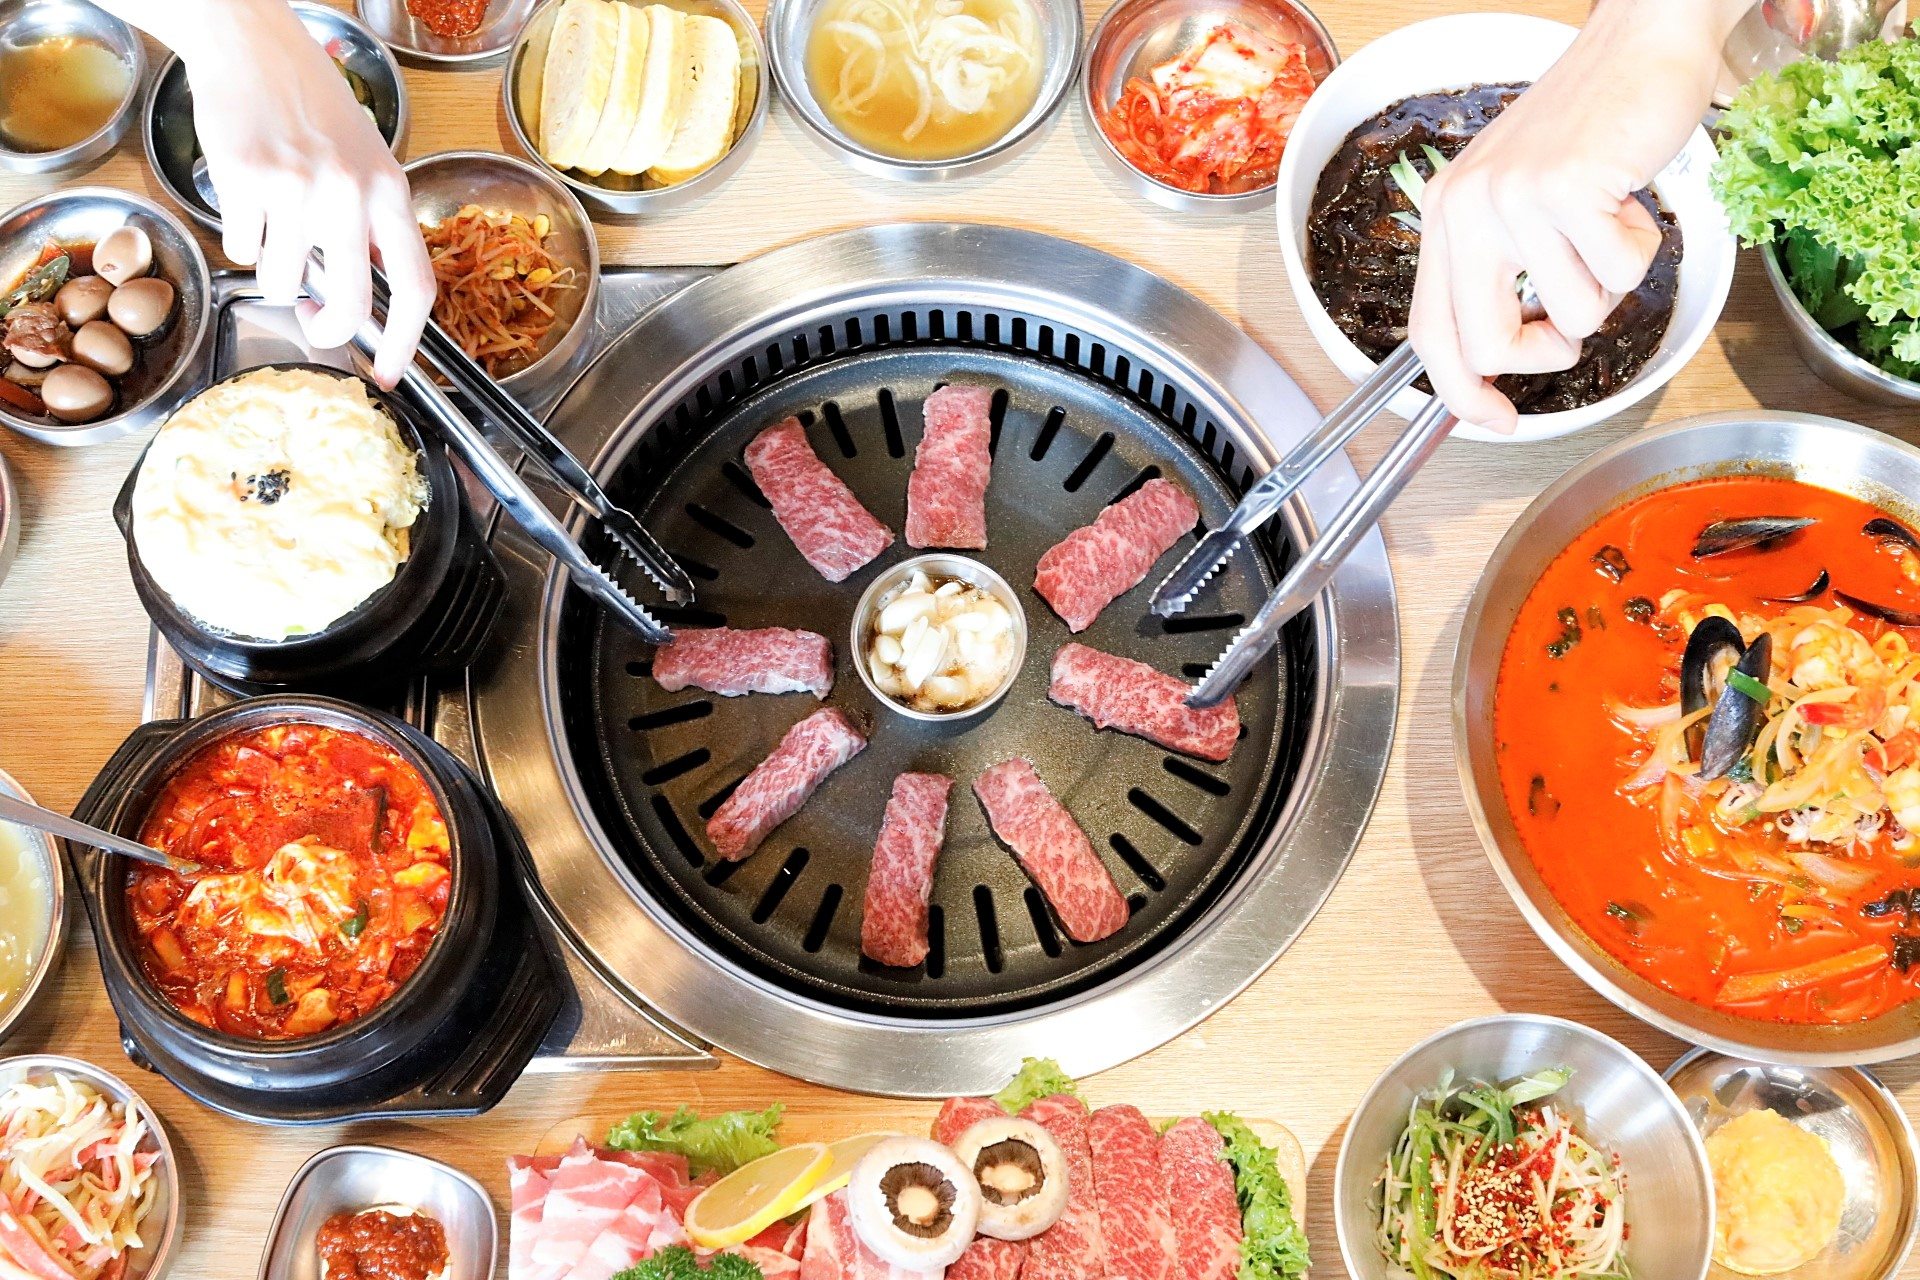 O Bba Bbq Jjajang Popular Korean Bbq Restaurant Opens New Outlet Till 2am With Jajangmyeon And Cheesy Korean Pancake Danielfooddiary Com